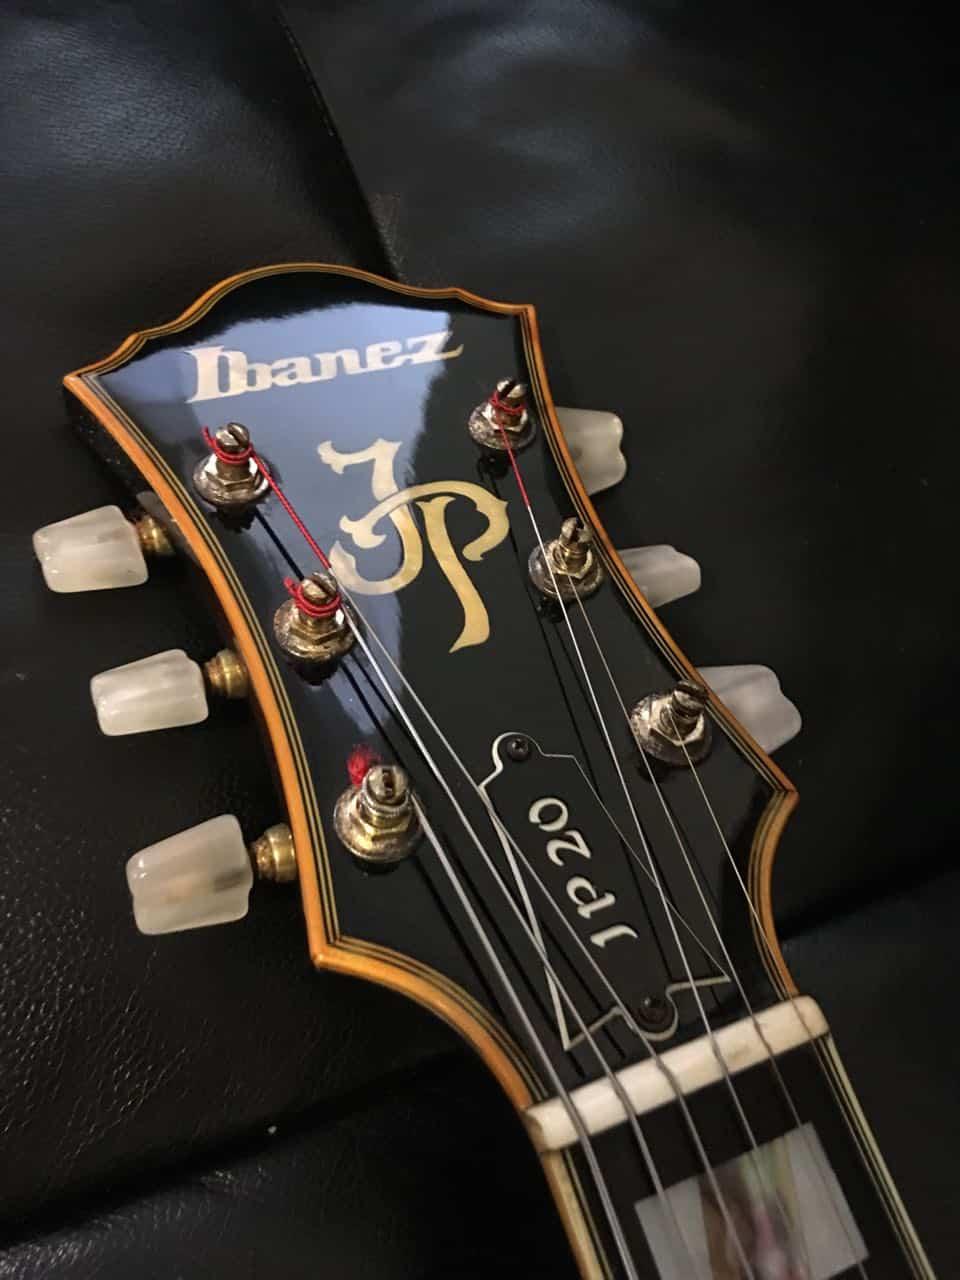 Ibanez-JP20-JoePass-1980-7